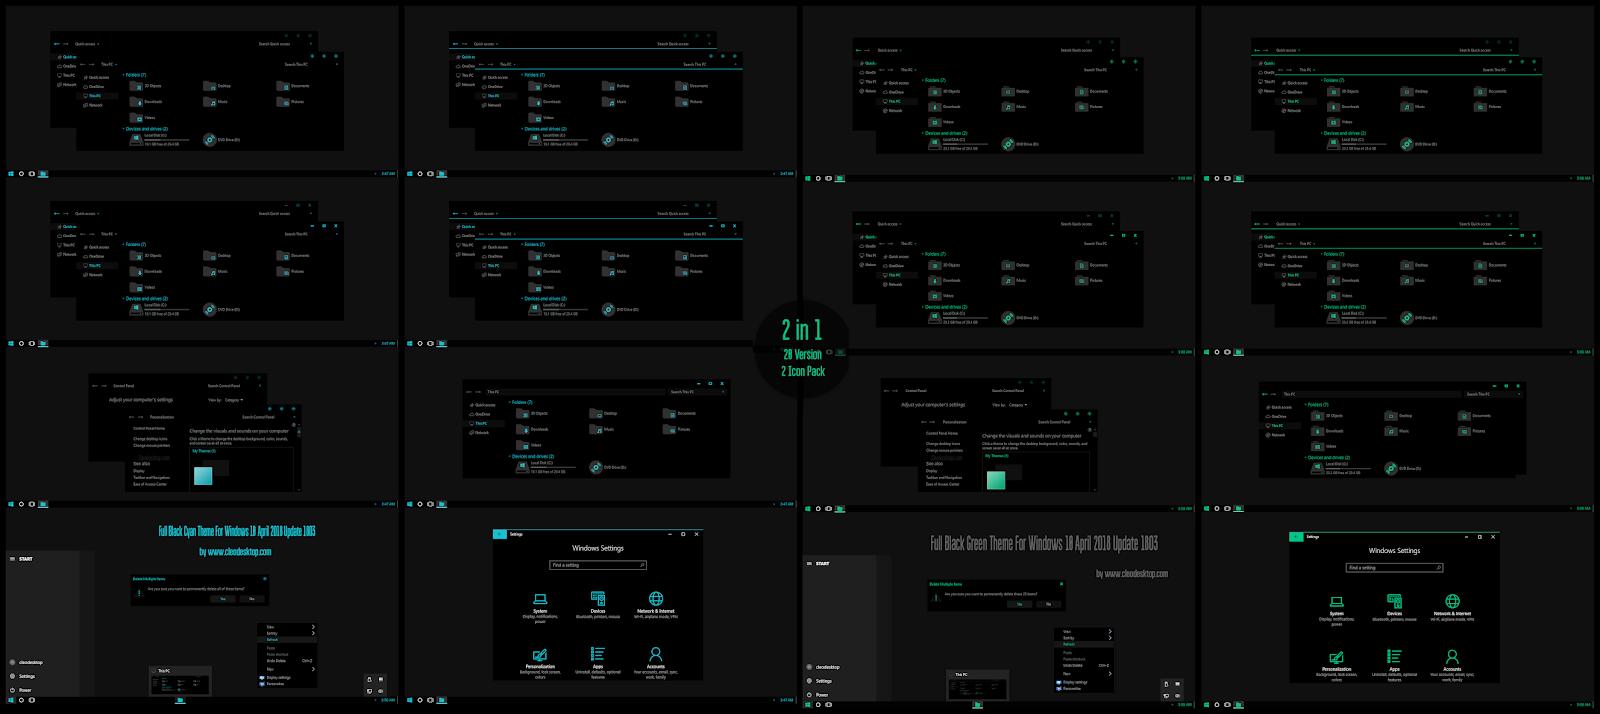 Windows10 Themes I Cleodesktop Full Black Cyan And Green Theme Windows10 April 2018 Update 1803 Green Theme Desktop Themes Windows